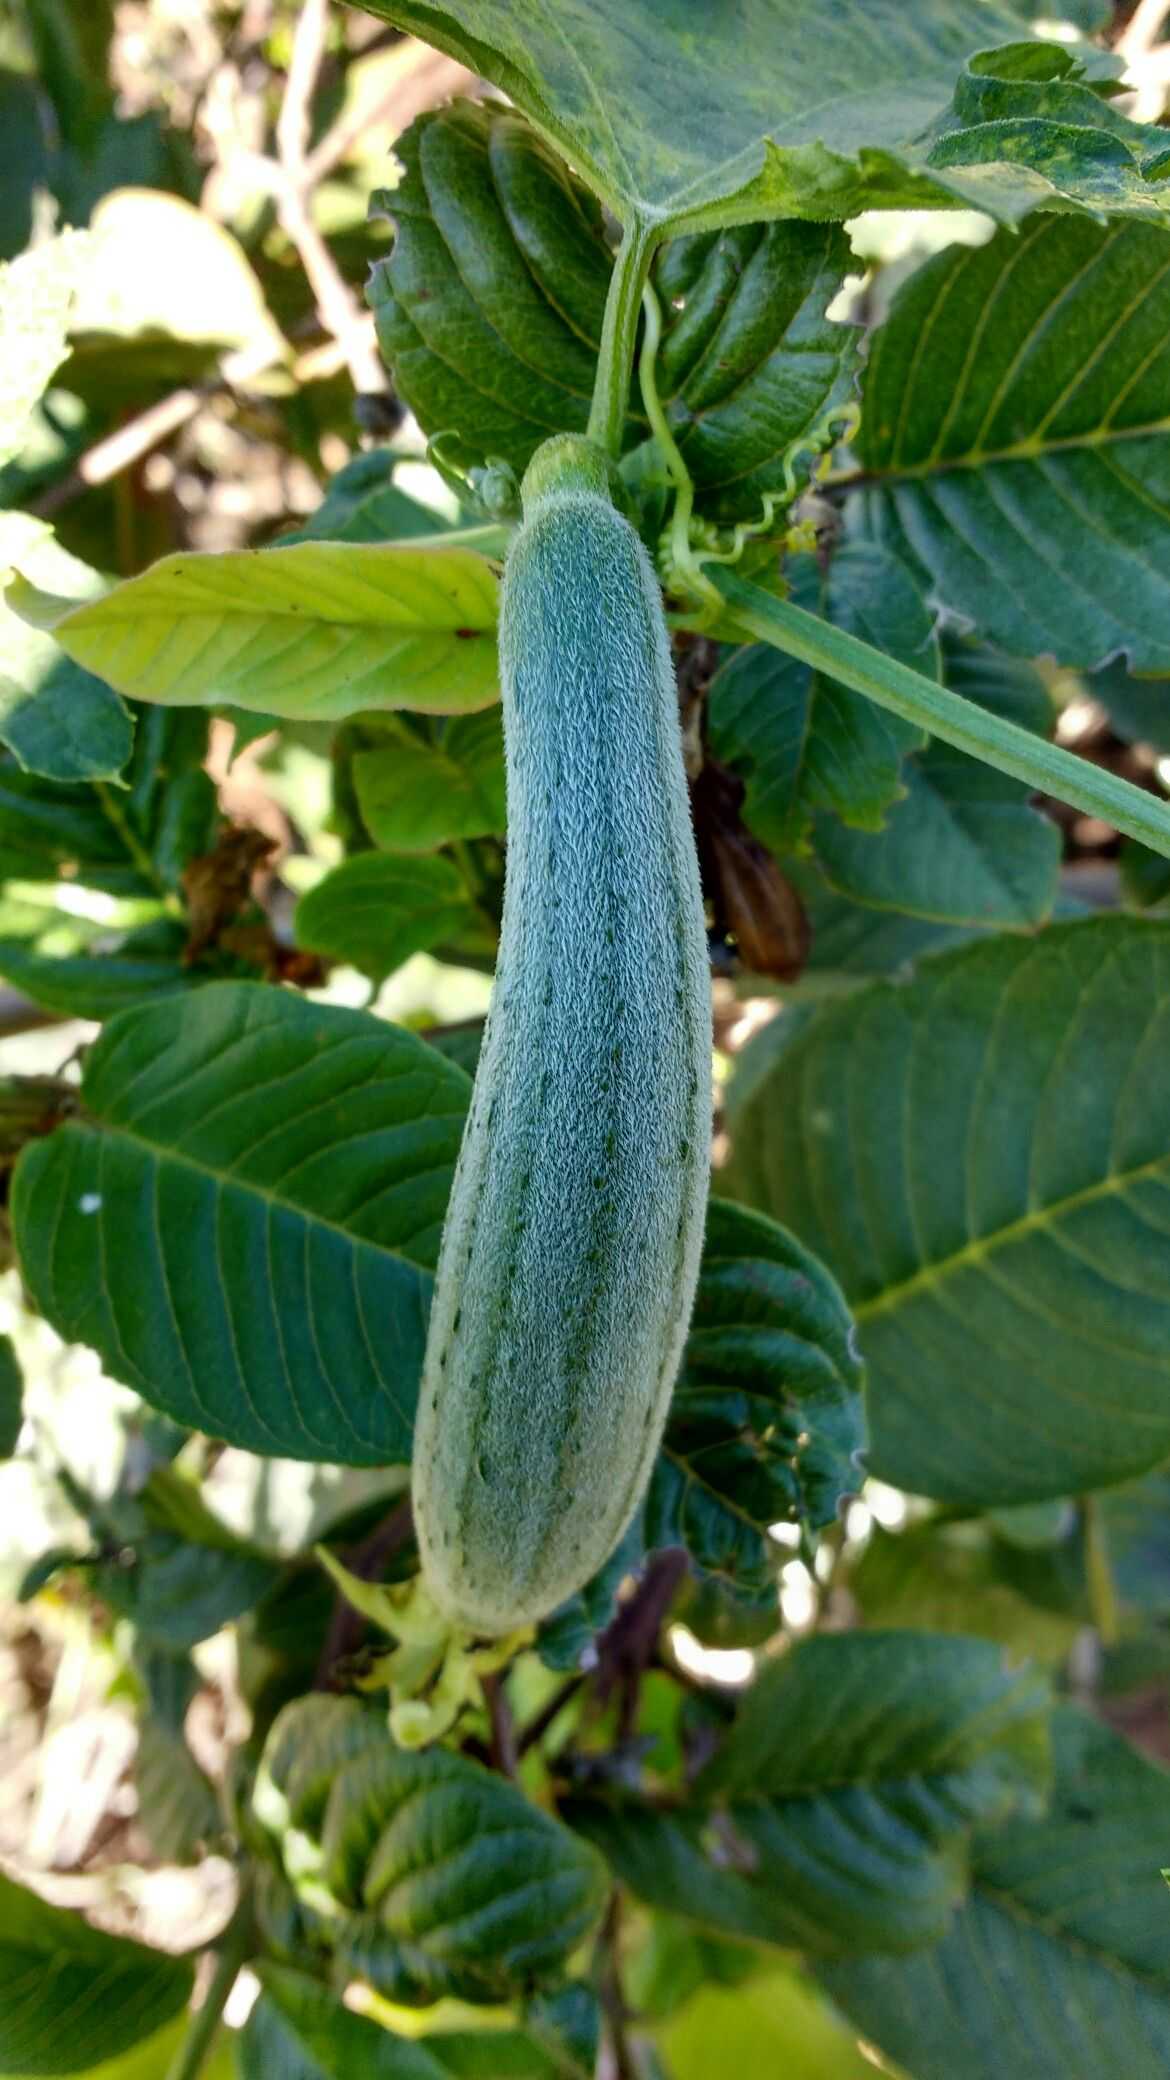 Bucha vegetal